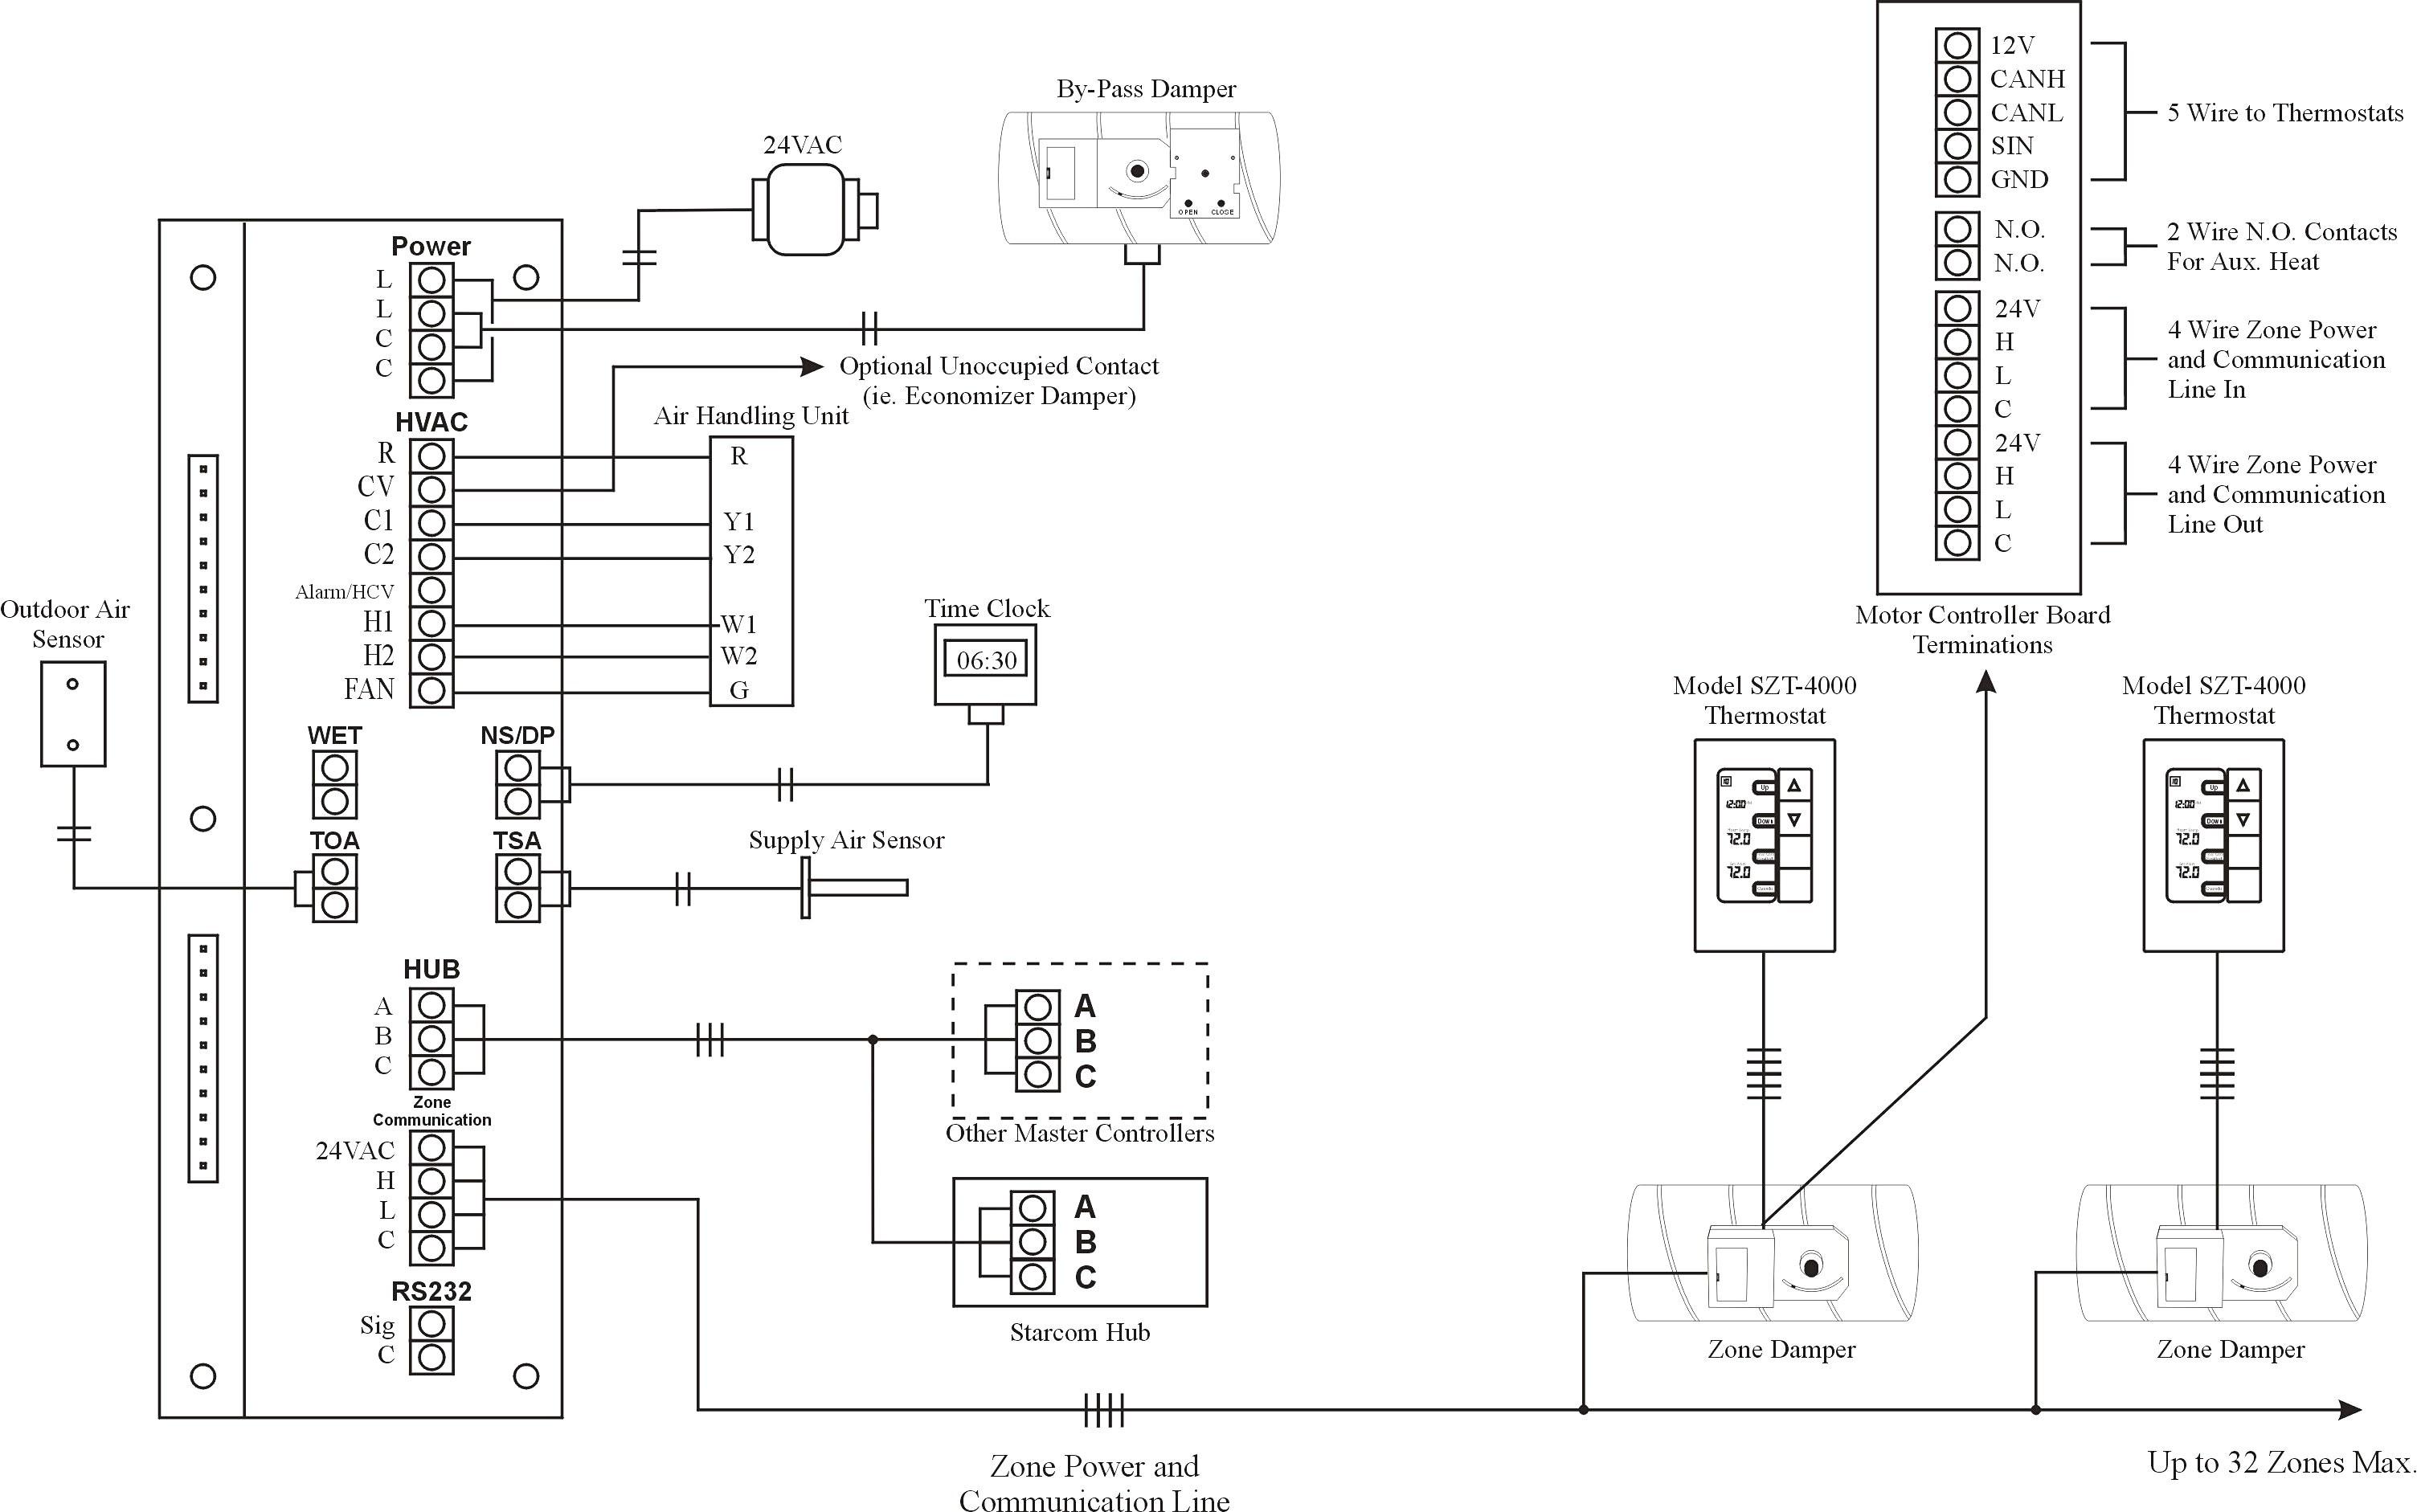 1996 Honda Accord Engine Diagram Honda Cb 900 Wiring Diagram Honda Wiring Diagrams Instructions Of 1996 Honda Accord Engine Diagram